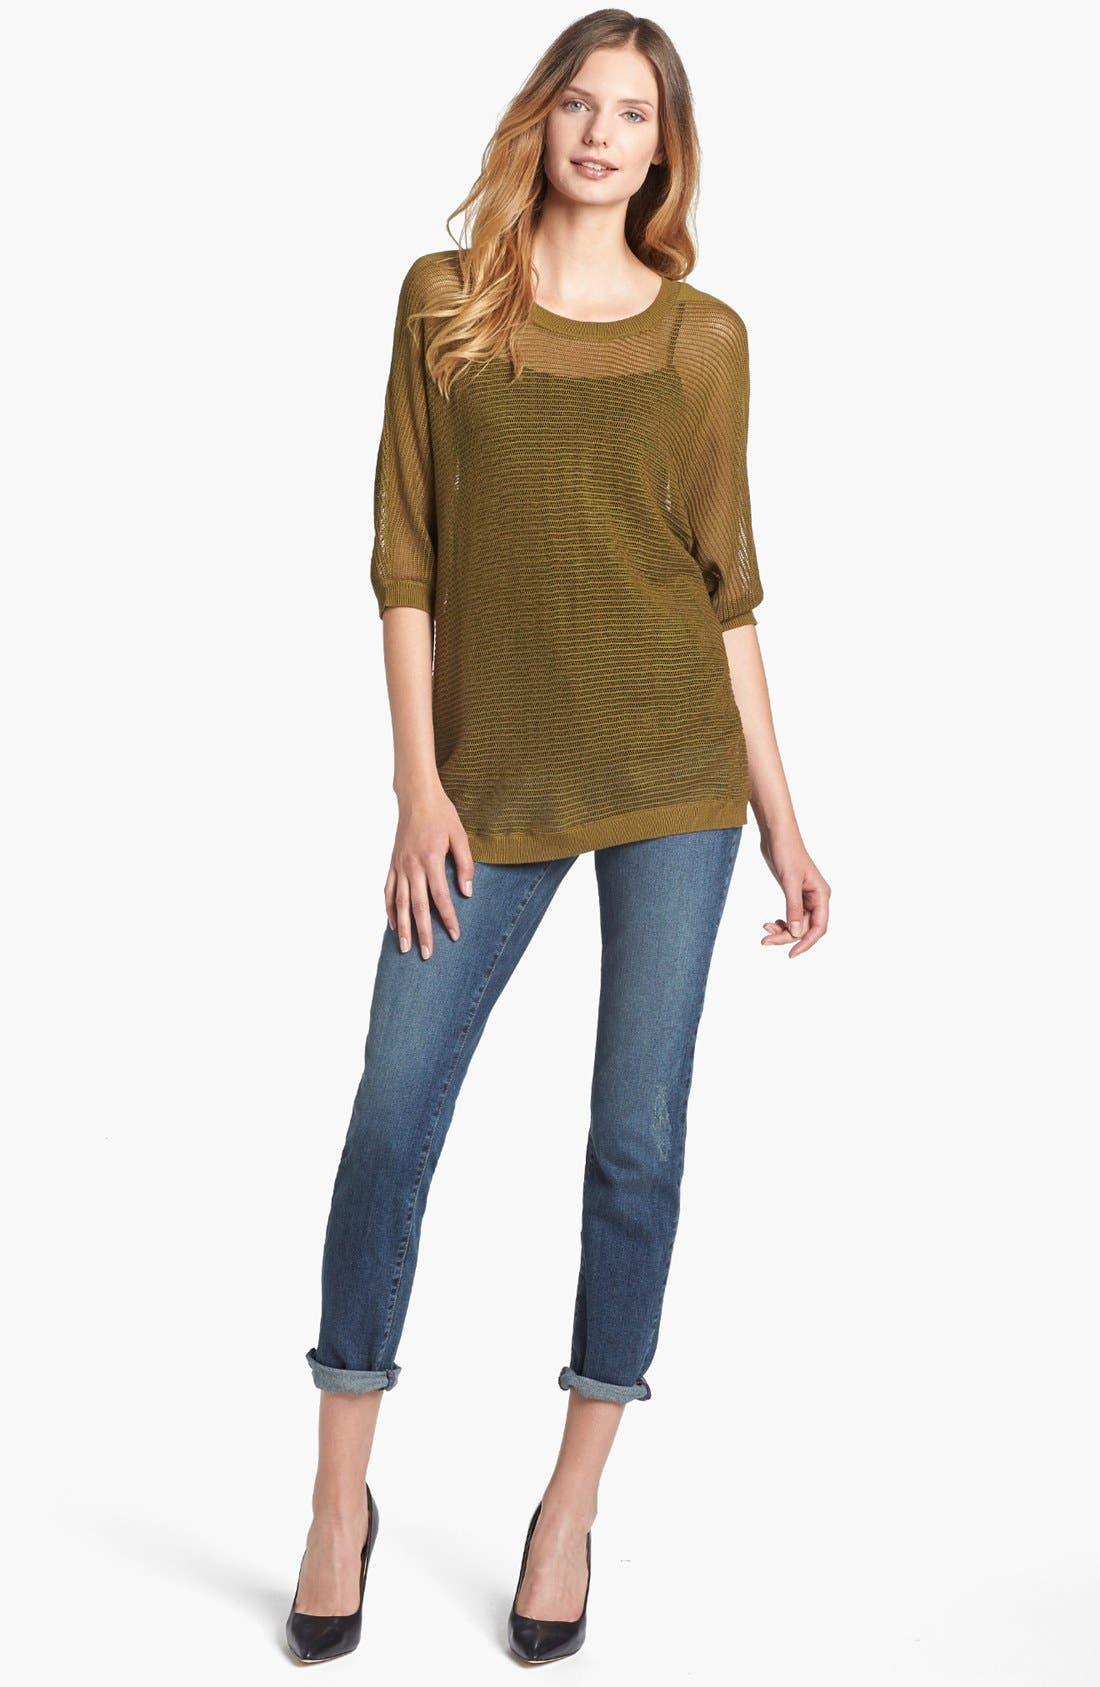 Alternate Image 1 Selected - NYDJ 'Leann' Stretch Skinny Boyfriend Jeans (Loma Linda)